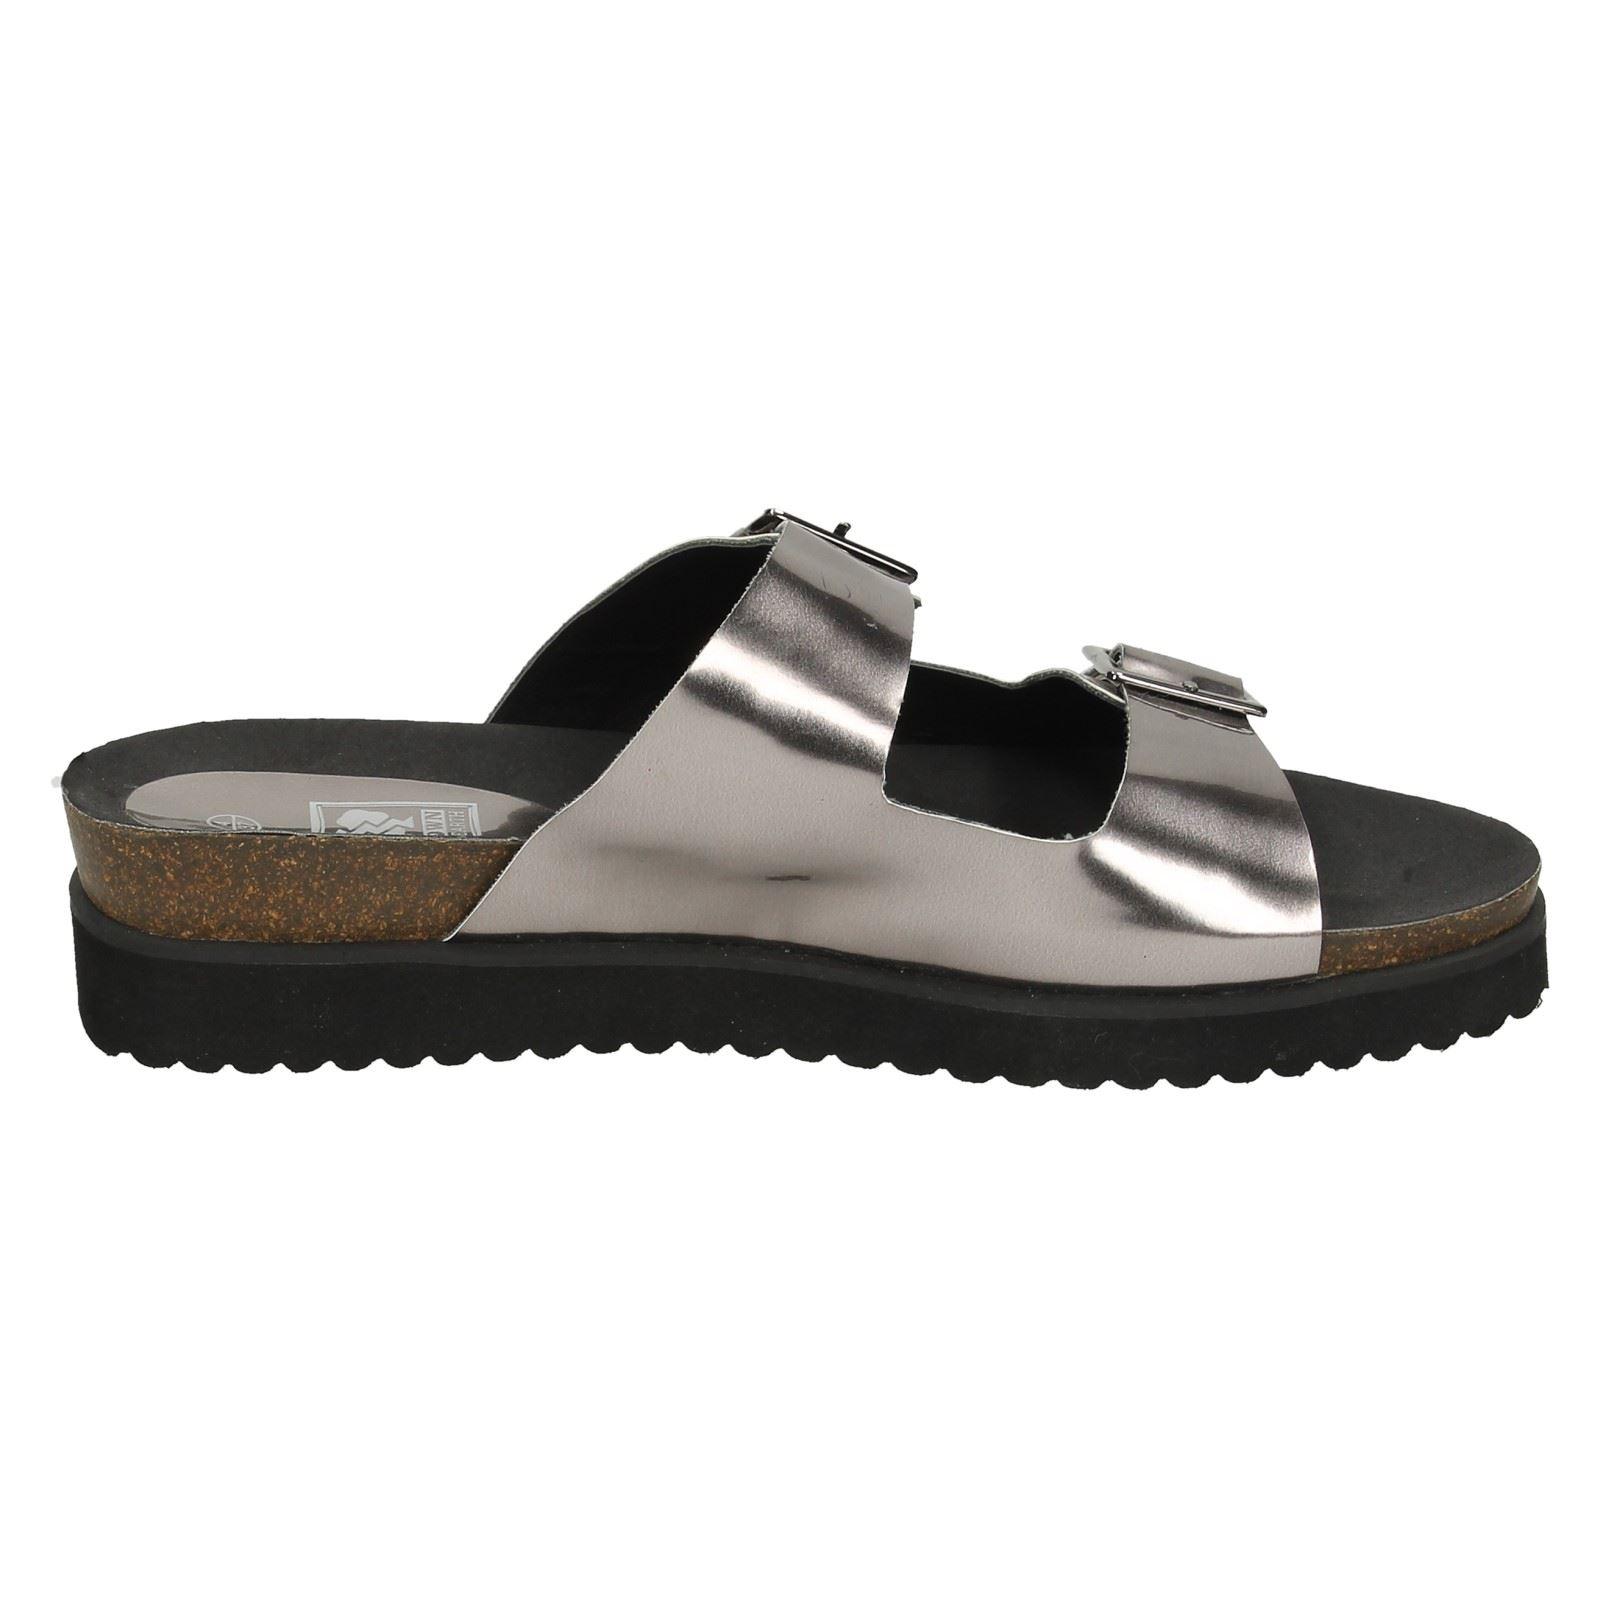 R15B Down to Earth F0R753 Ladies Tan Sandals